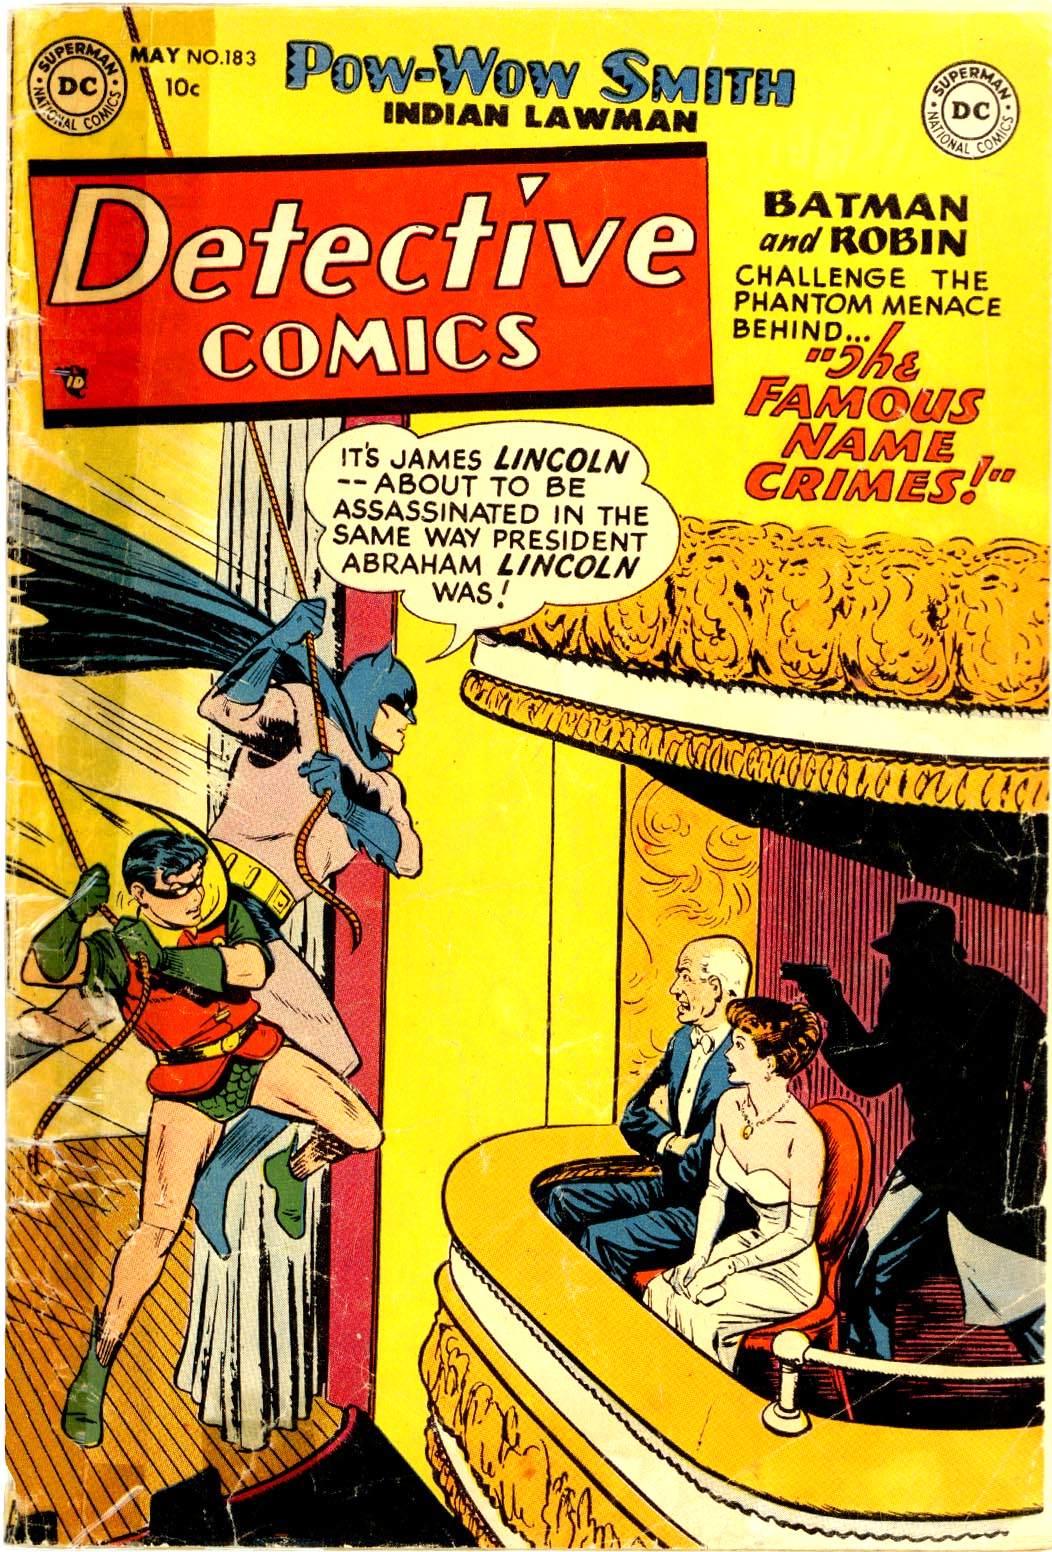 Detective Comics (1937) 183 Page 0